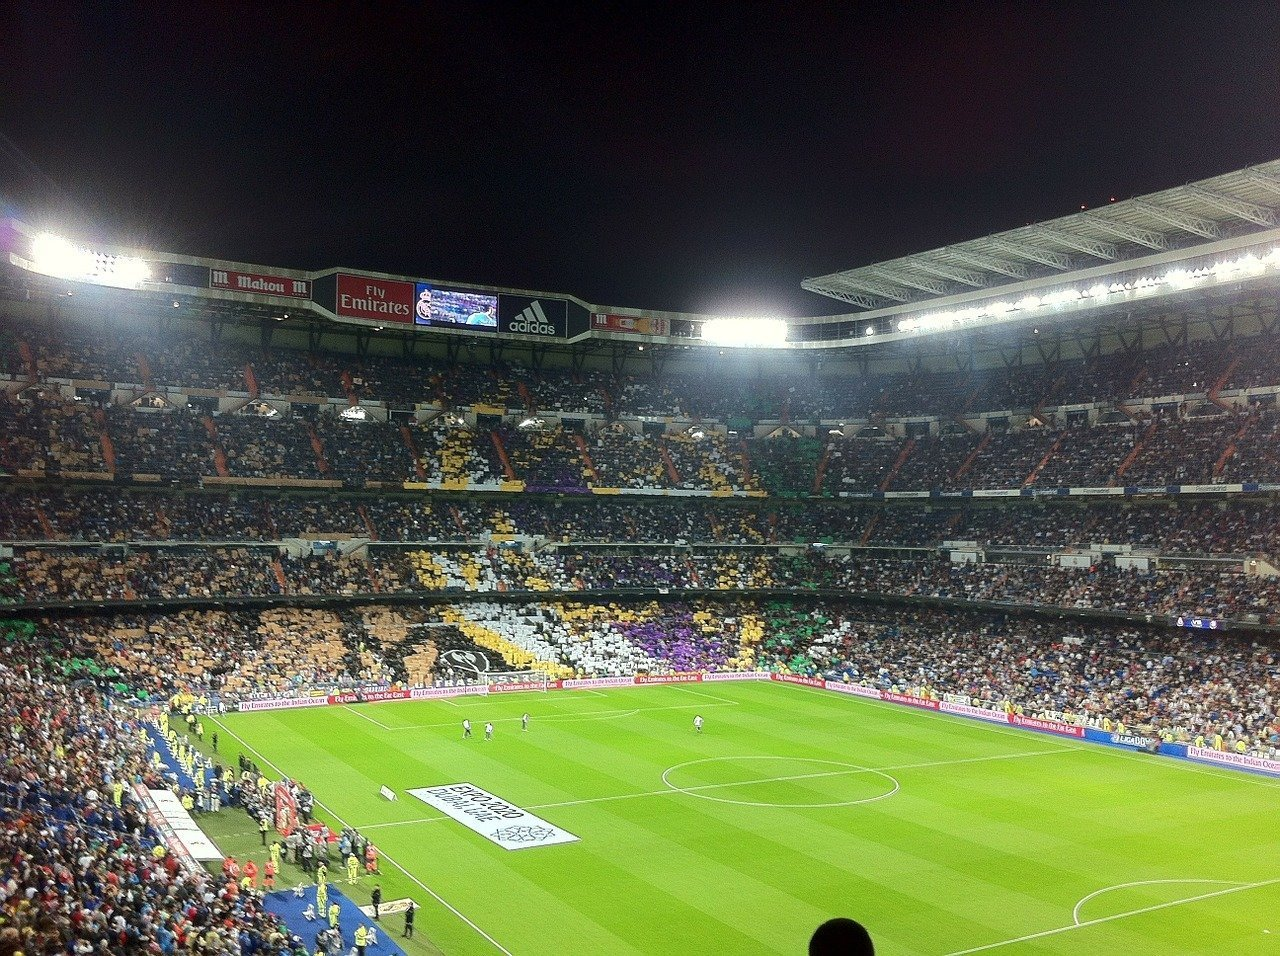 Así será la novena jornada de La Liga Santander - football-stadium-254443_1280